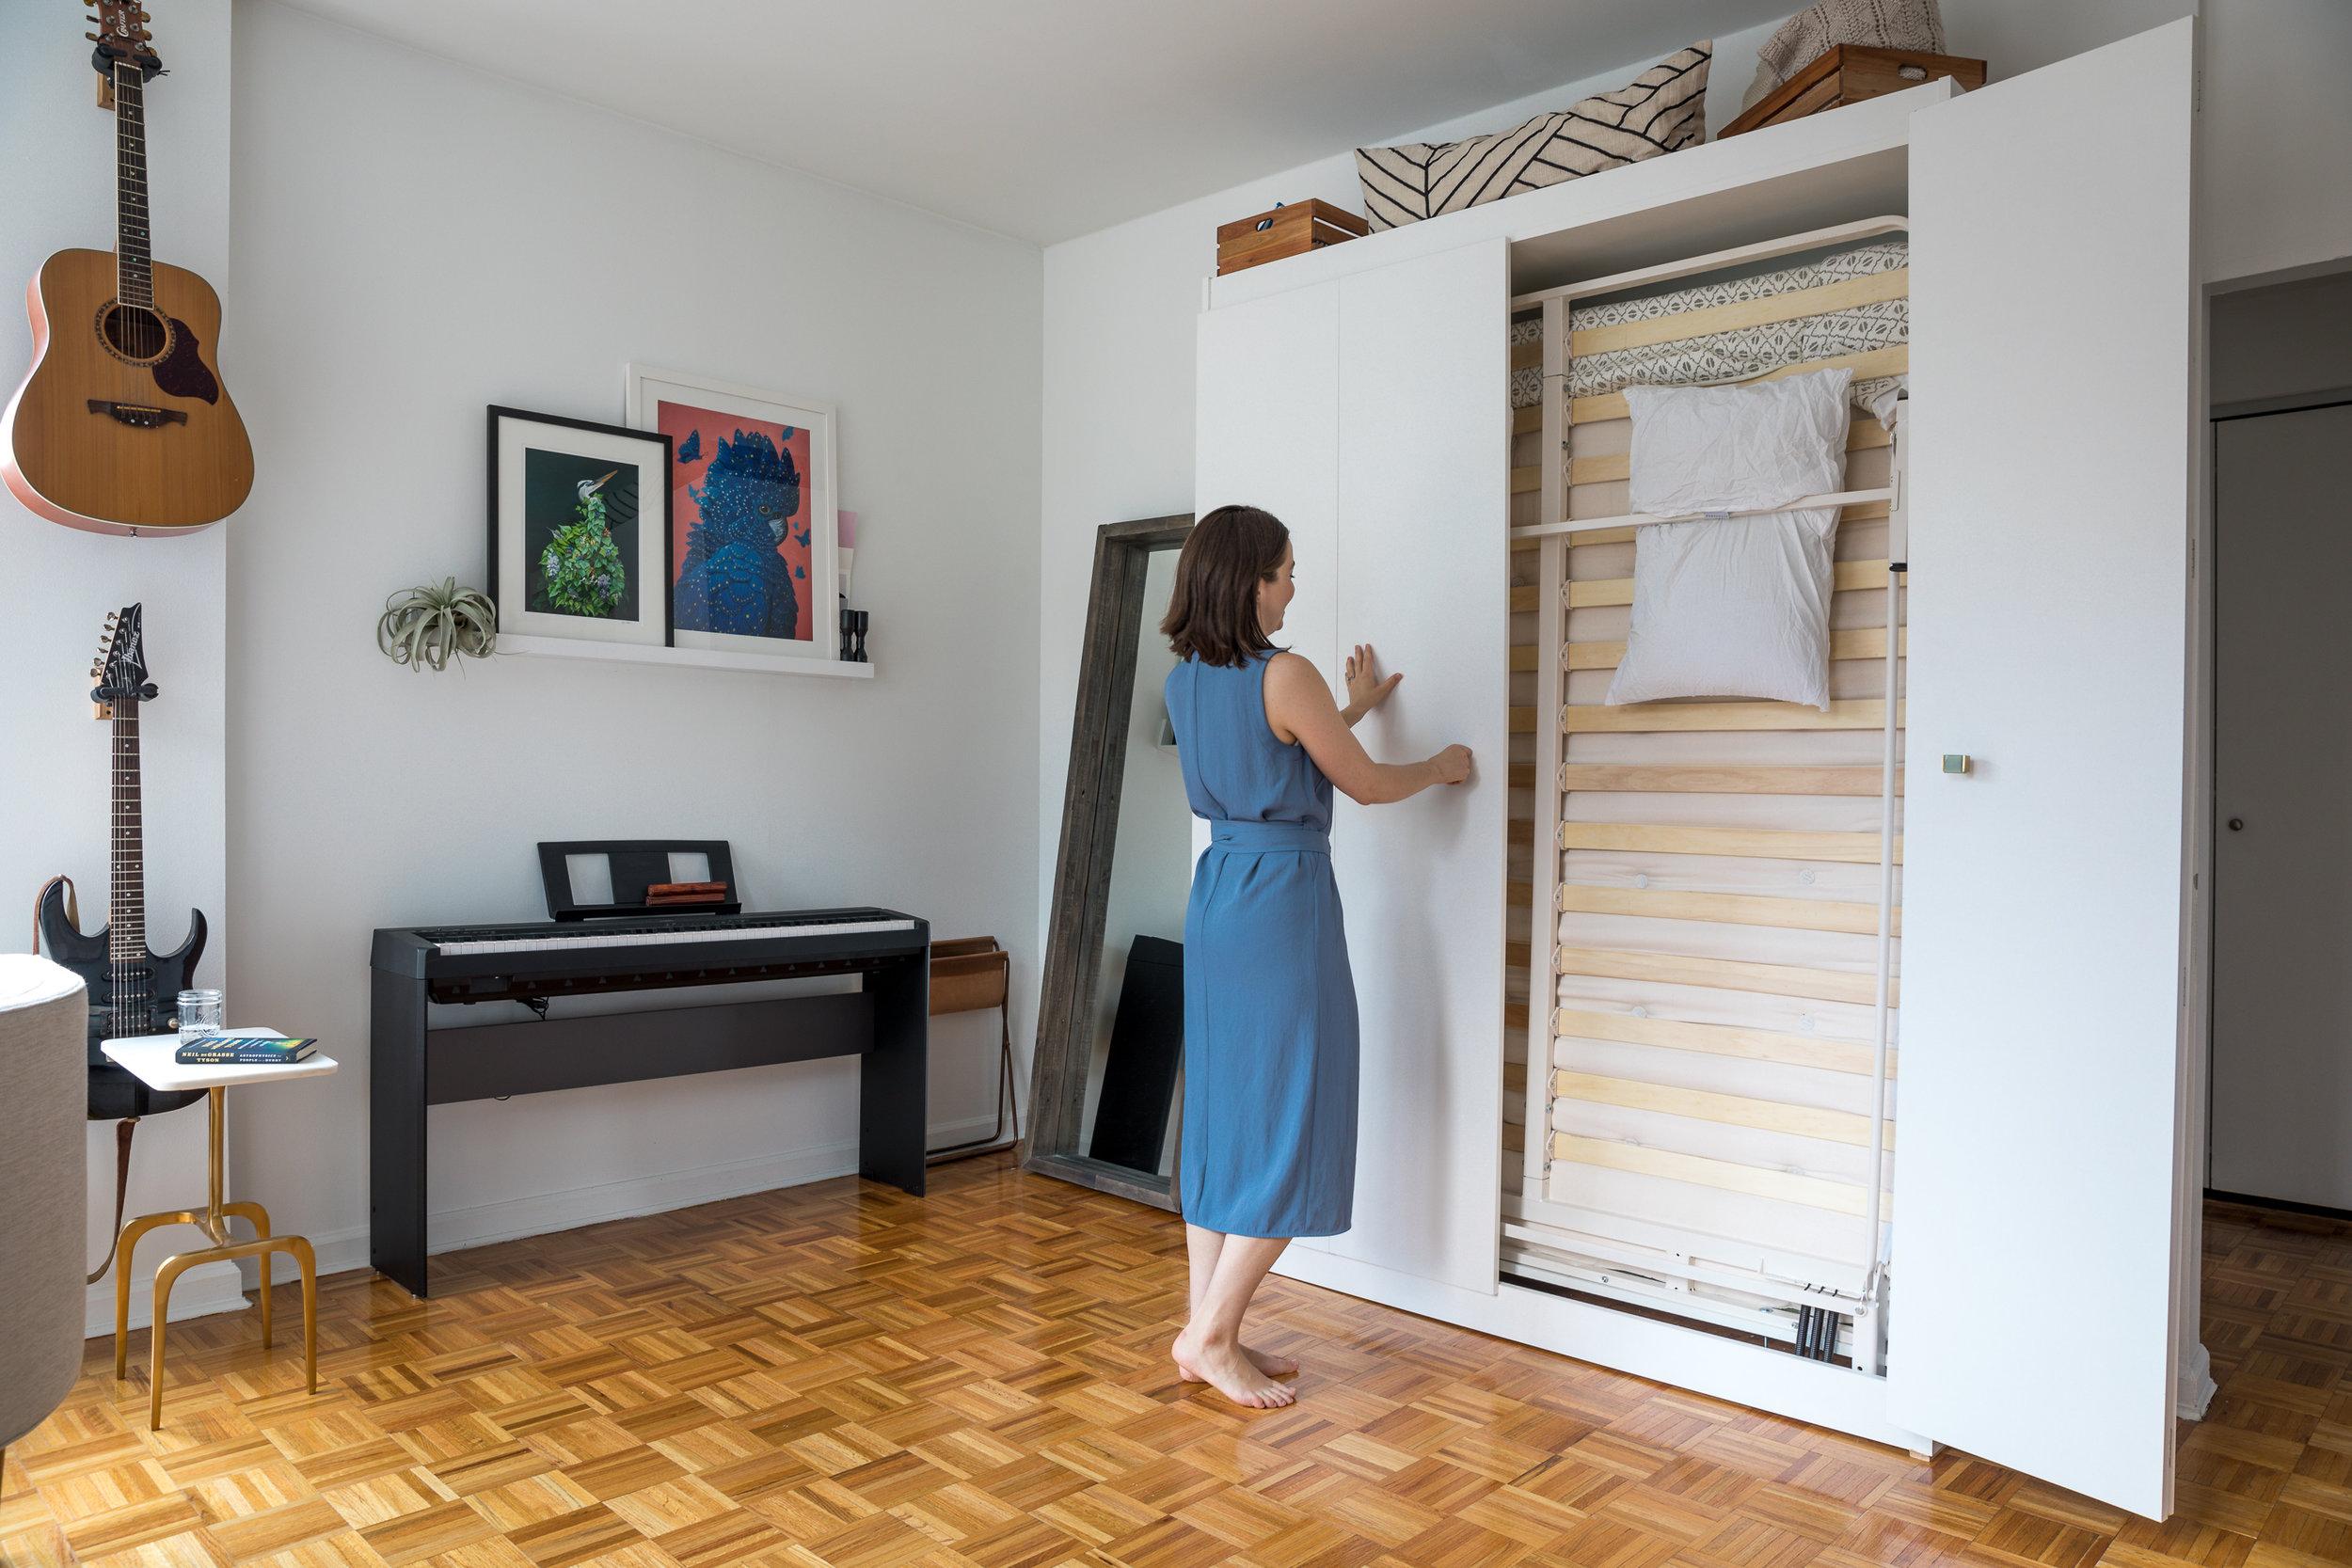 Wall Bed / Murphy Bed - closing the doors